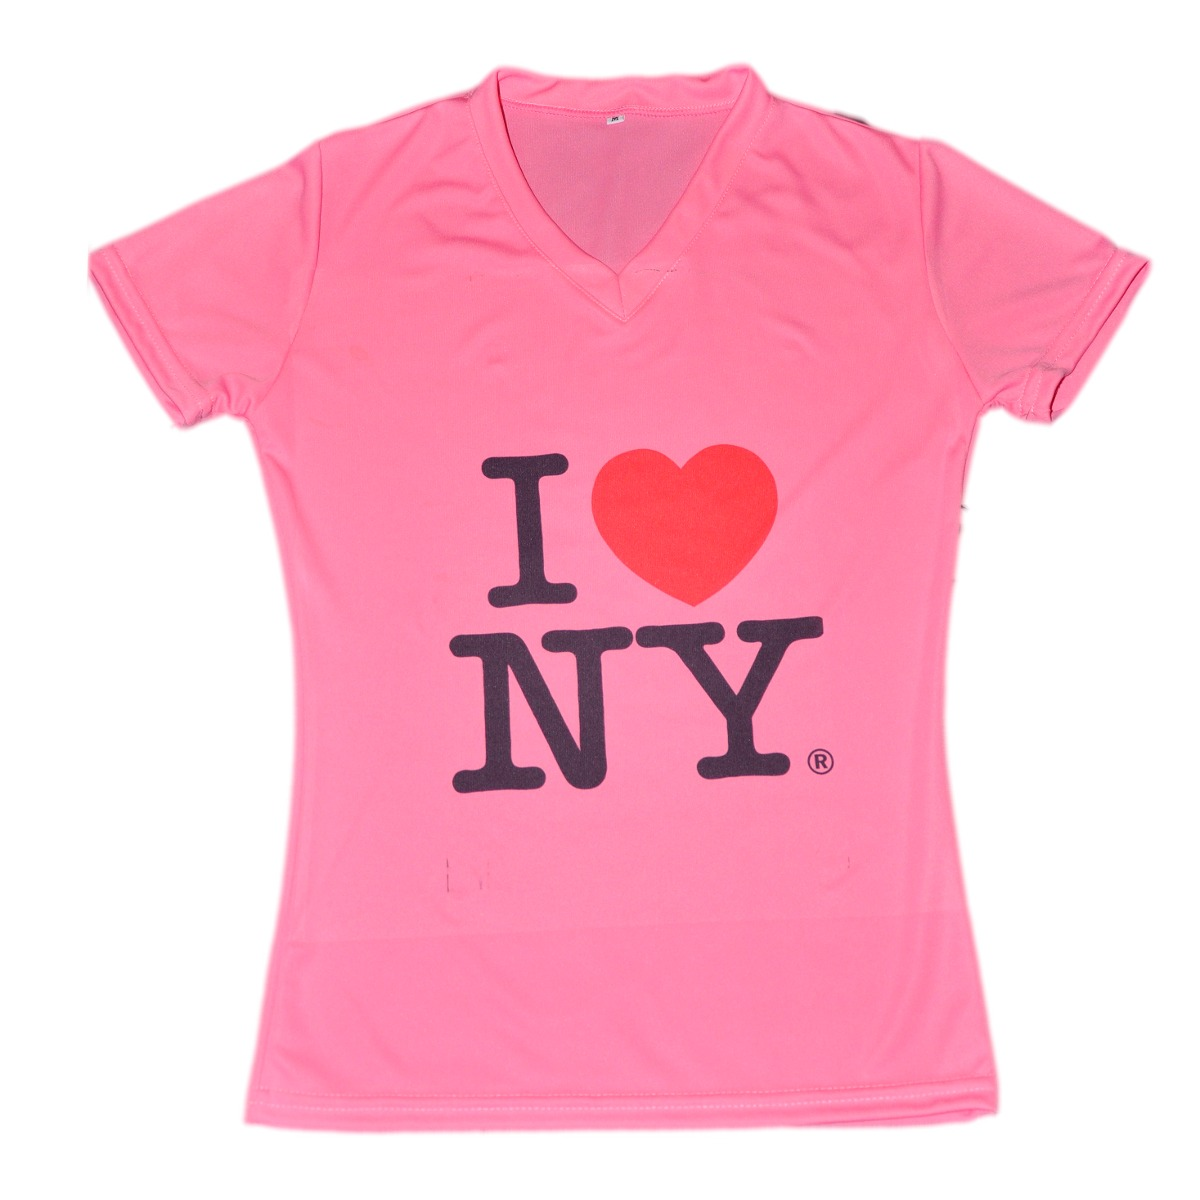 51a0490455 camiseta estampada personalizada 100%poliester - t-shirt. Cargando zoom.